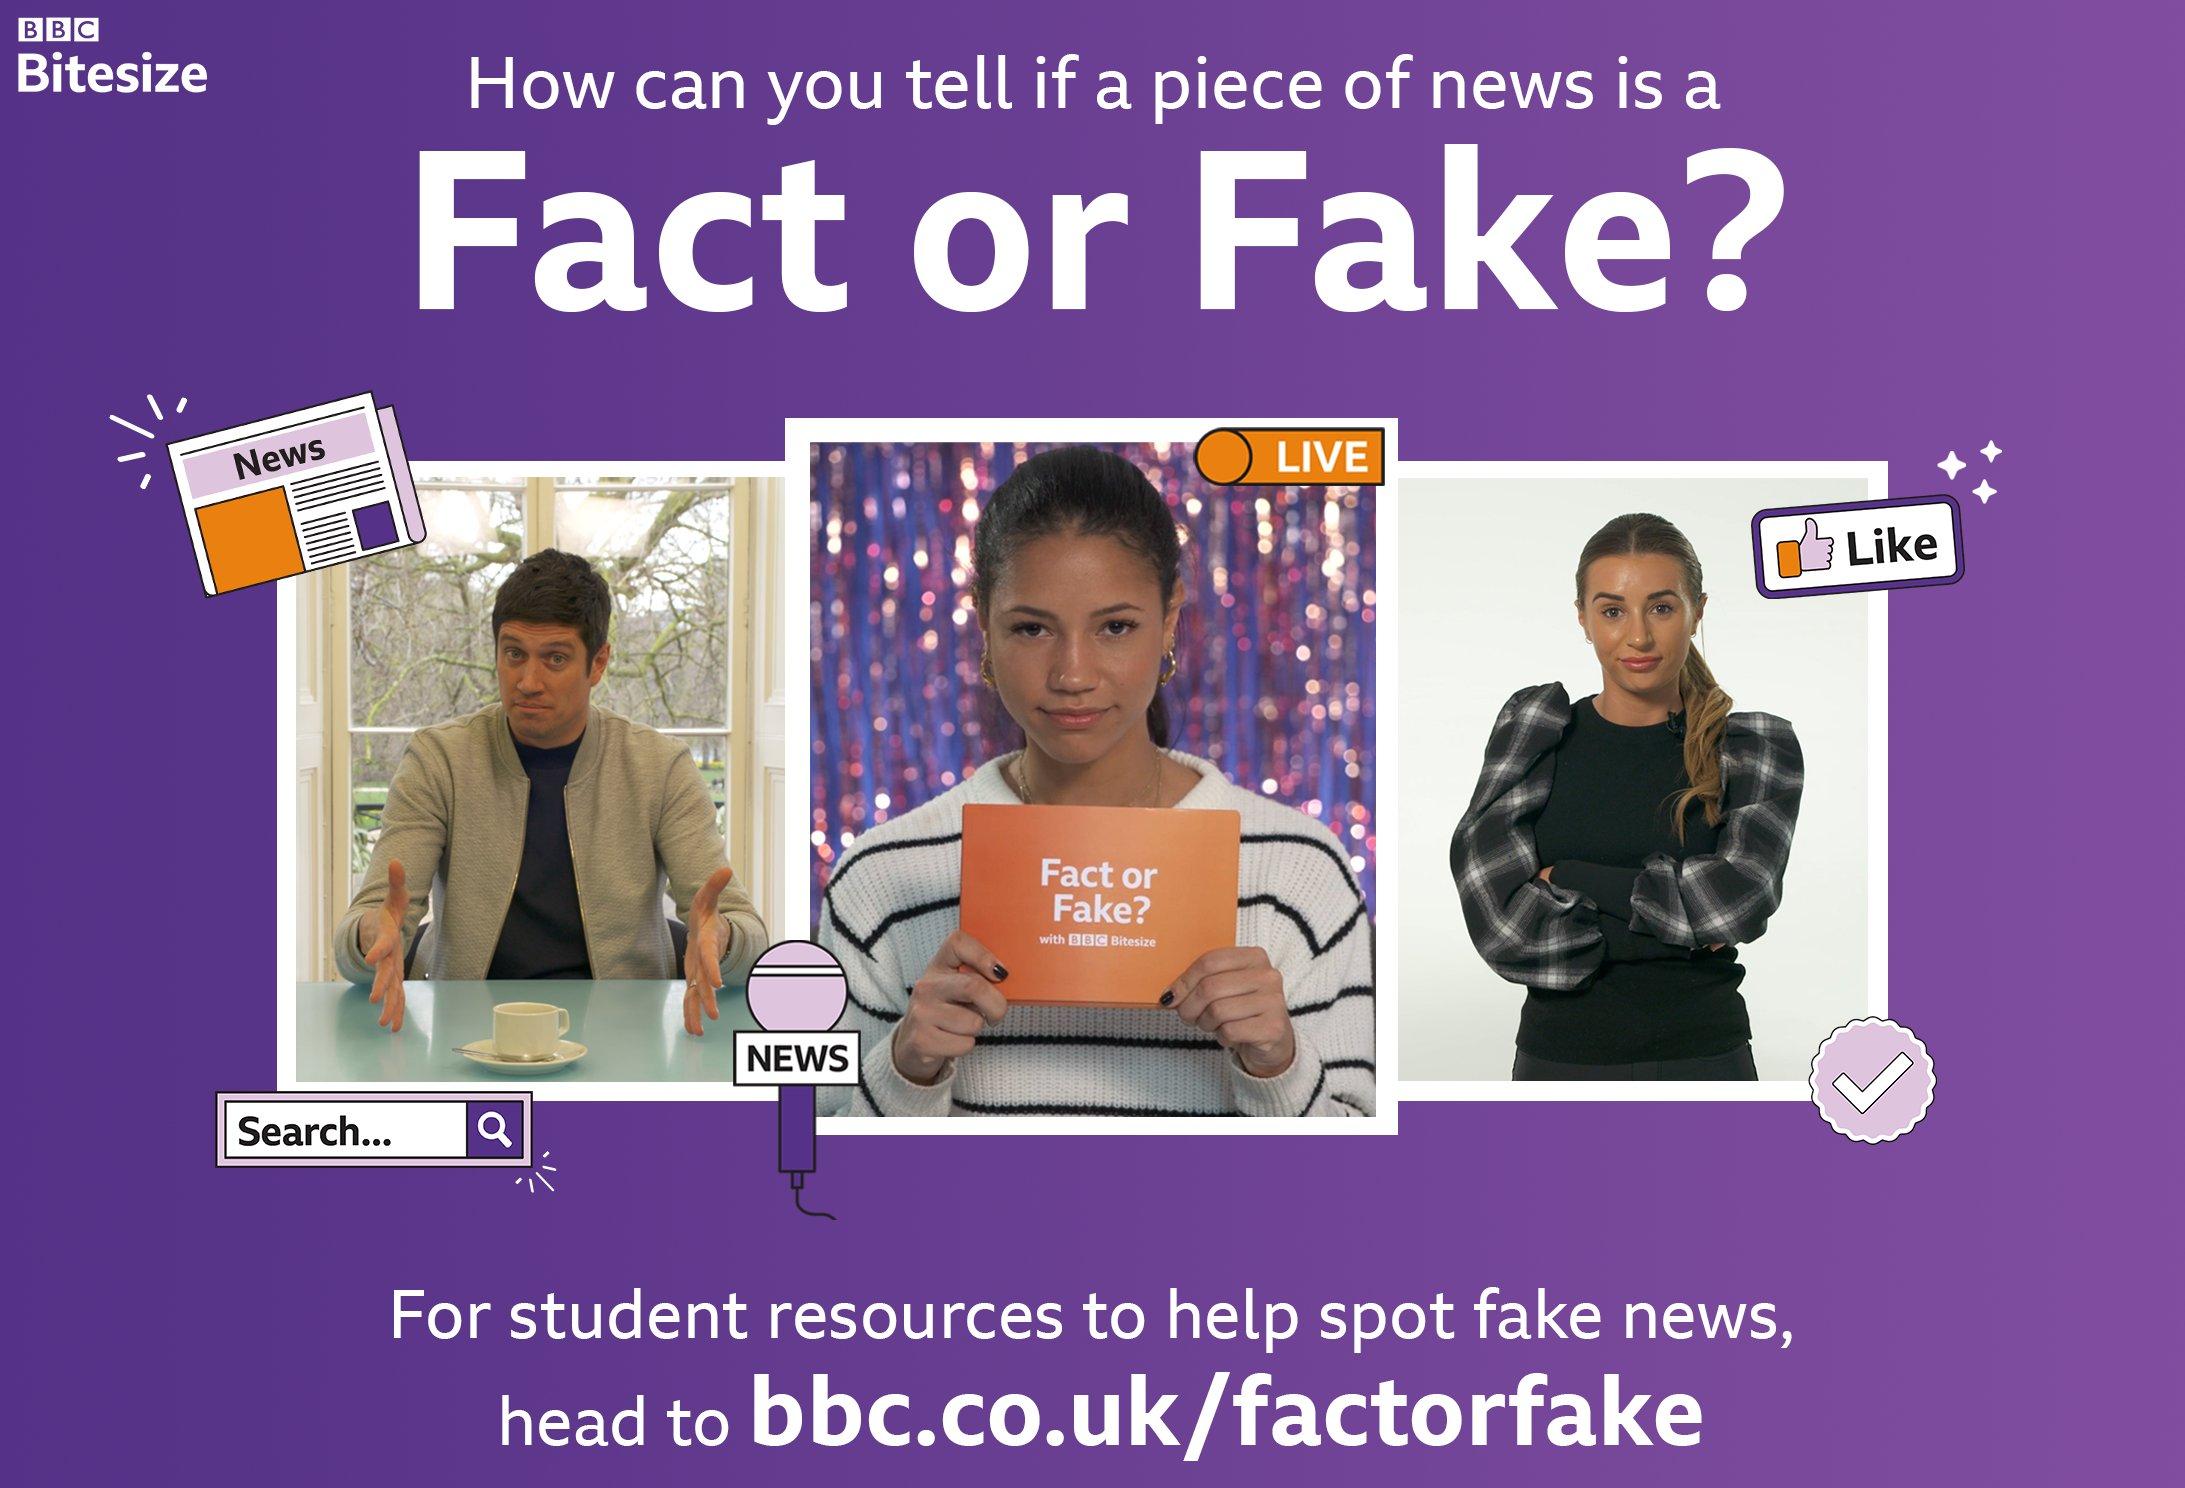 BBC Bitesize Fact or Fake? campaign